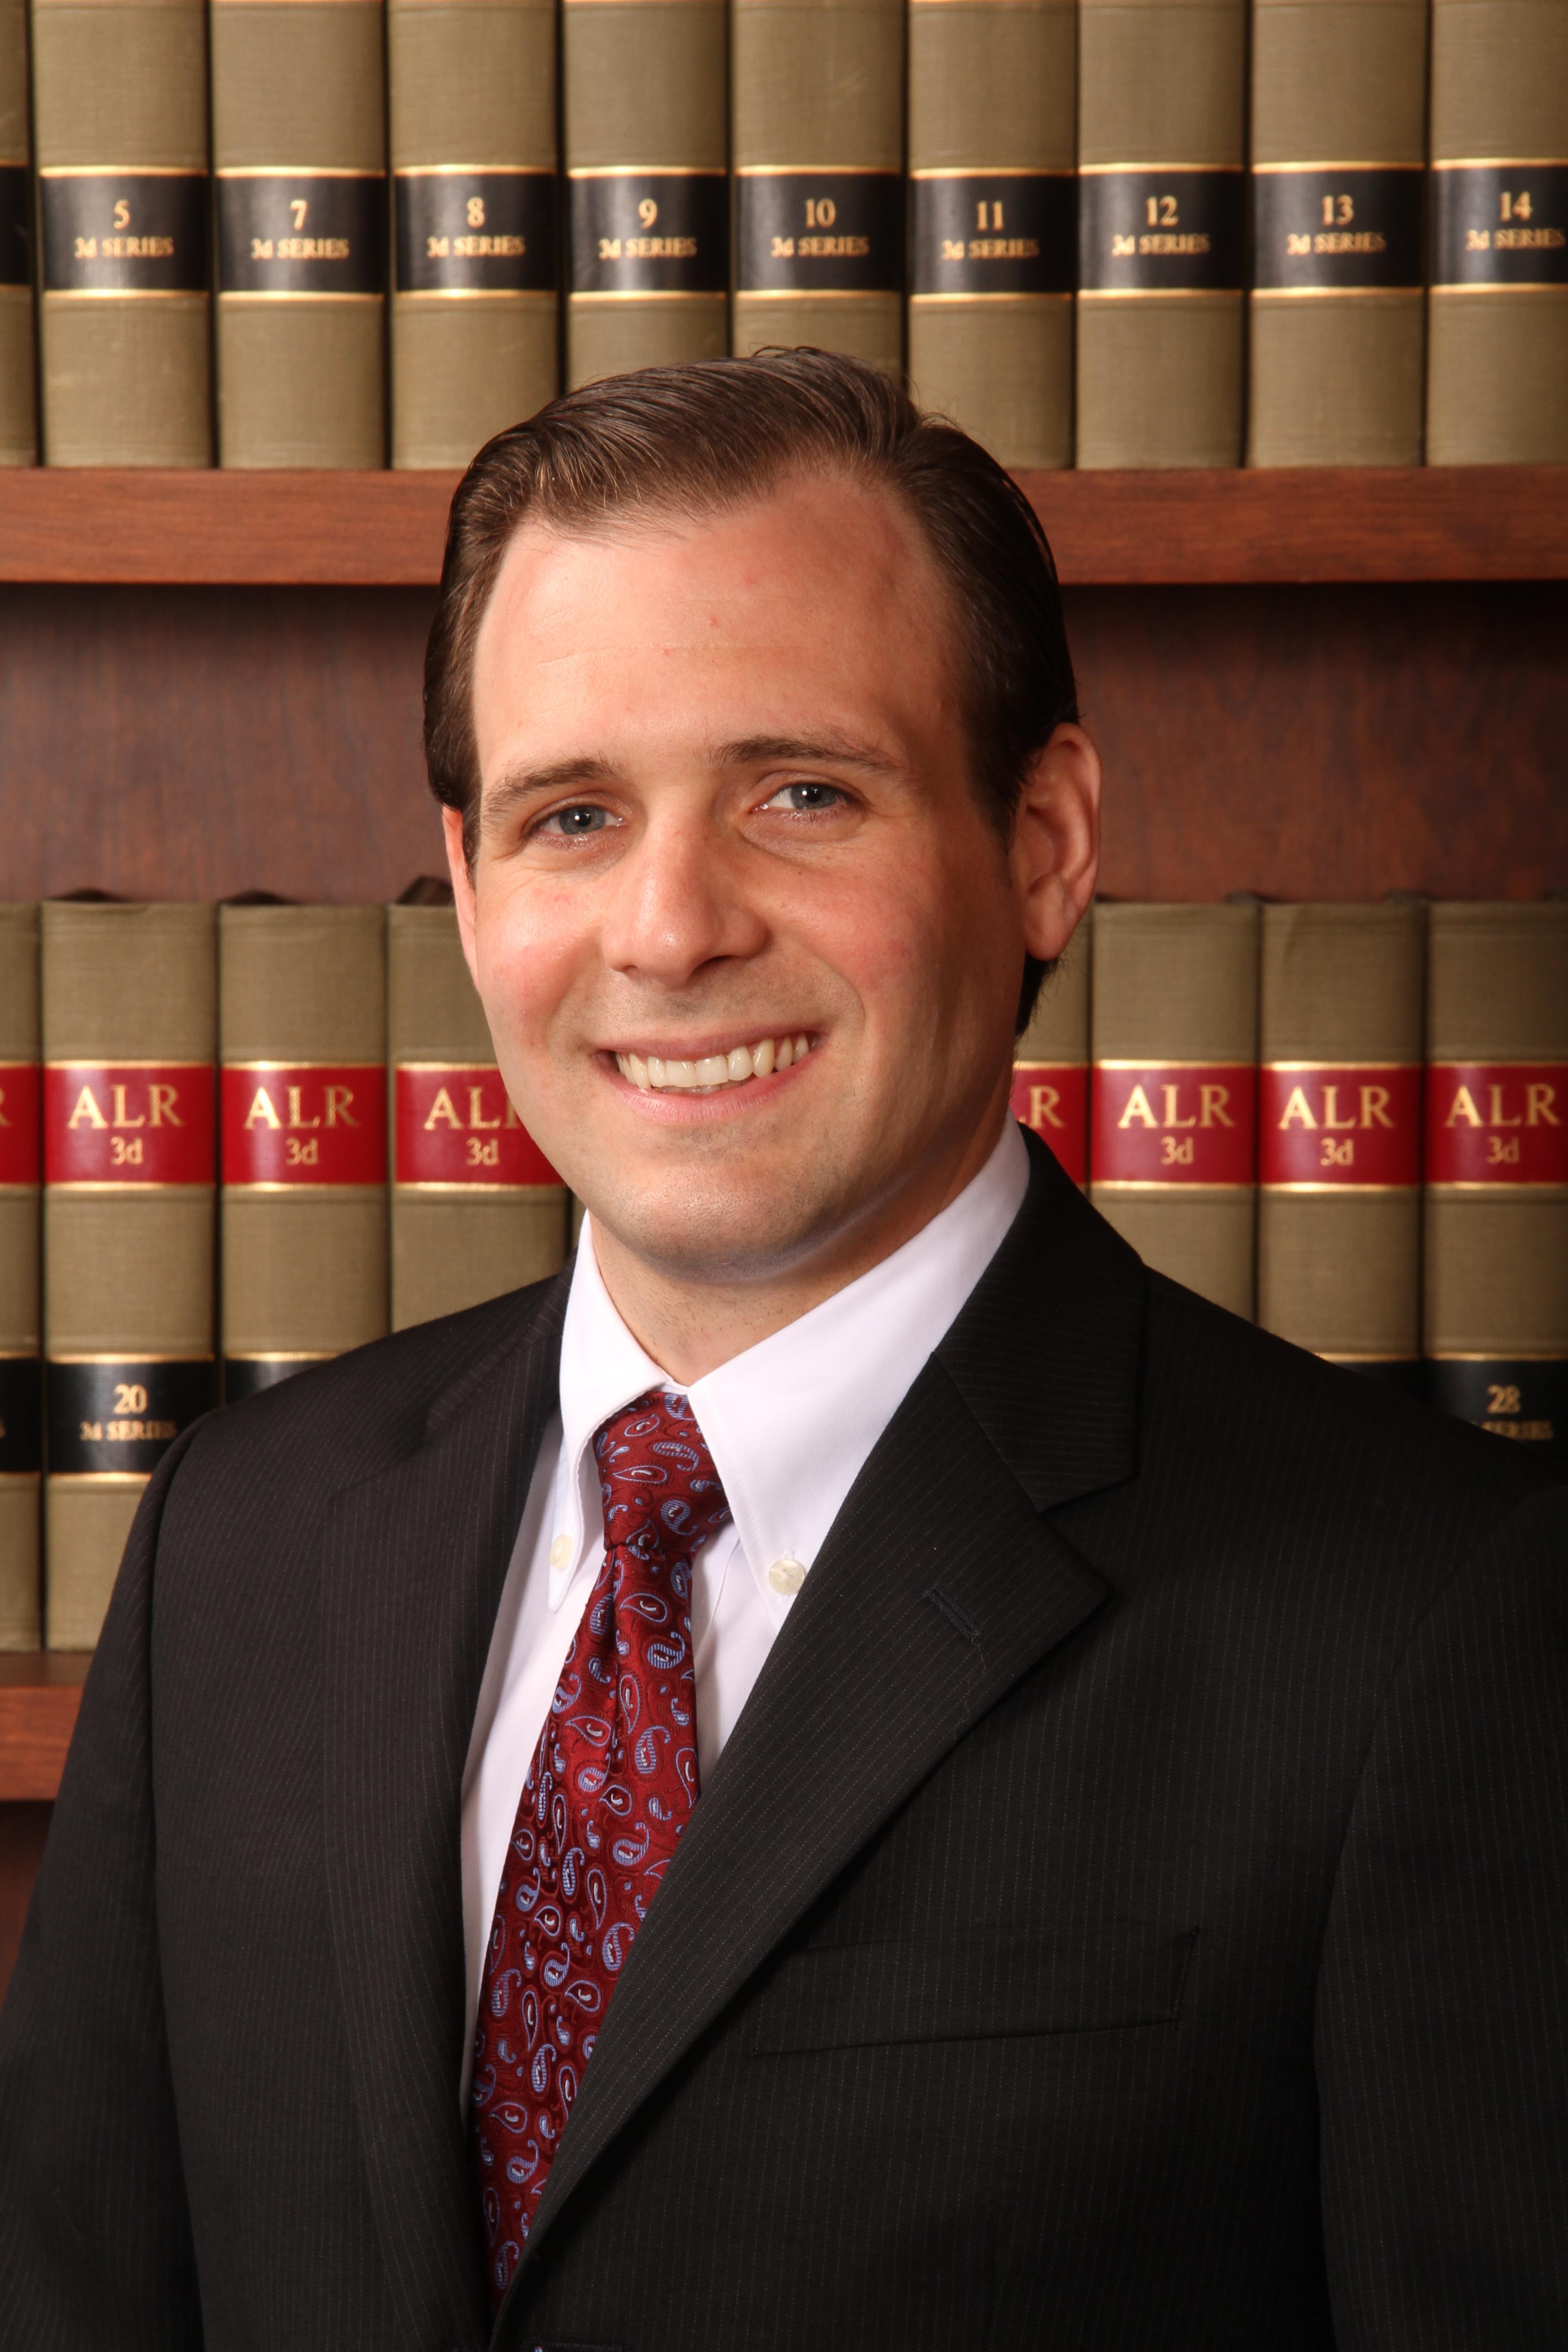 Michael M. Stahl